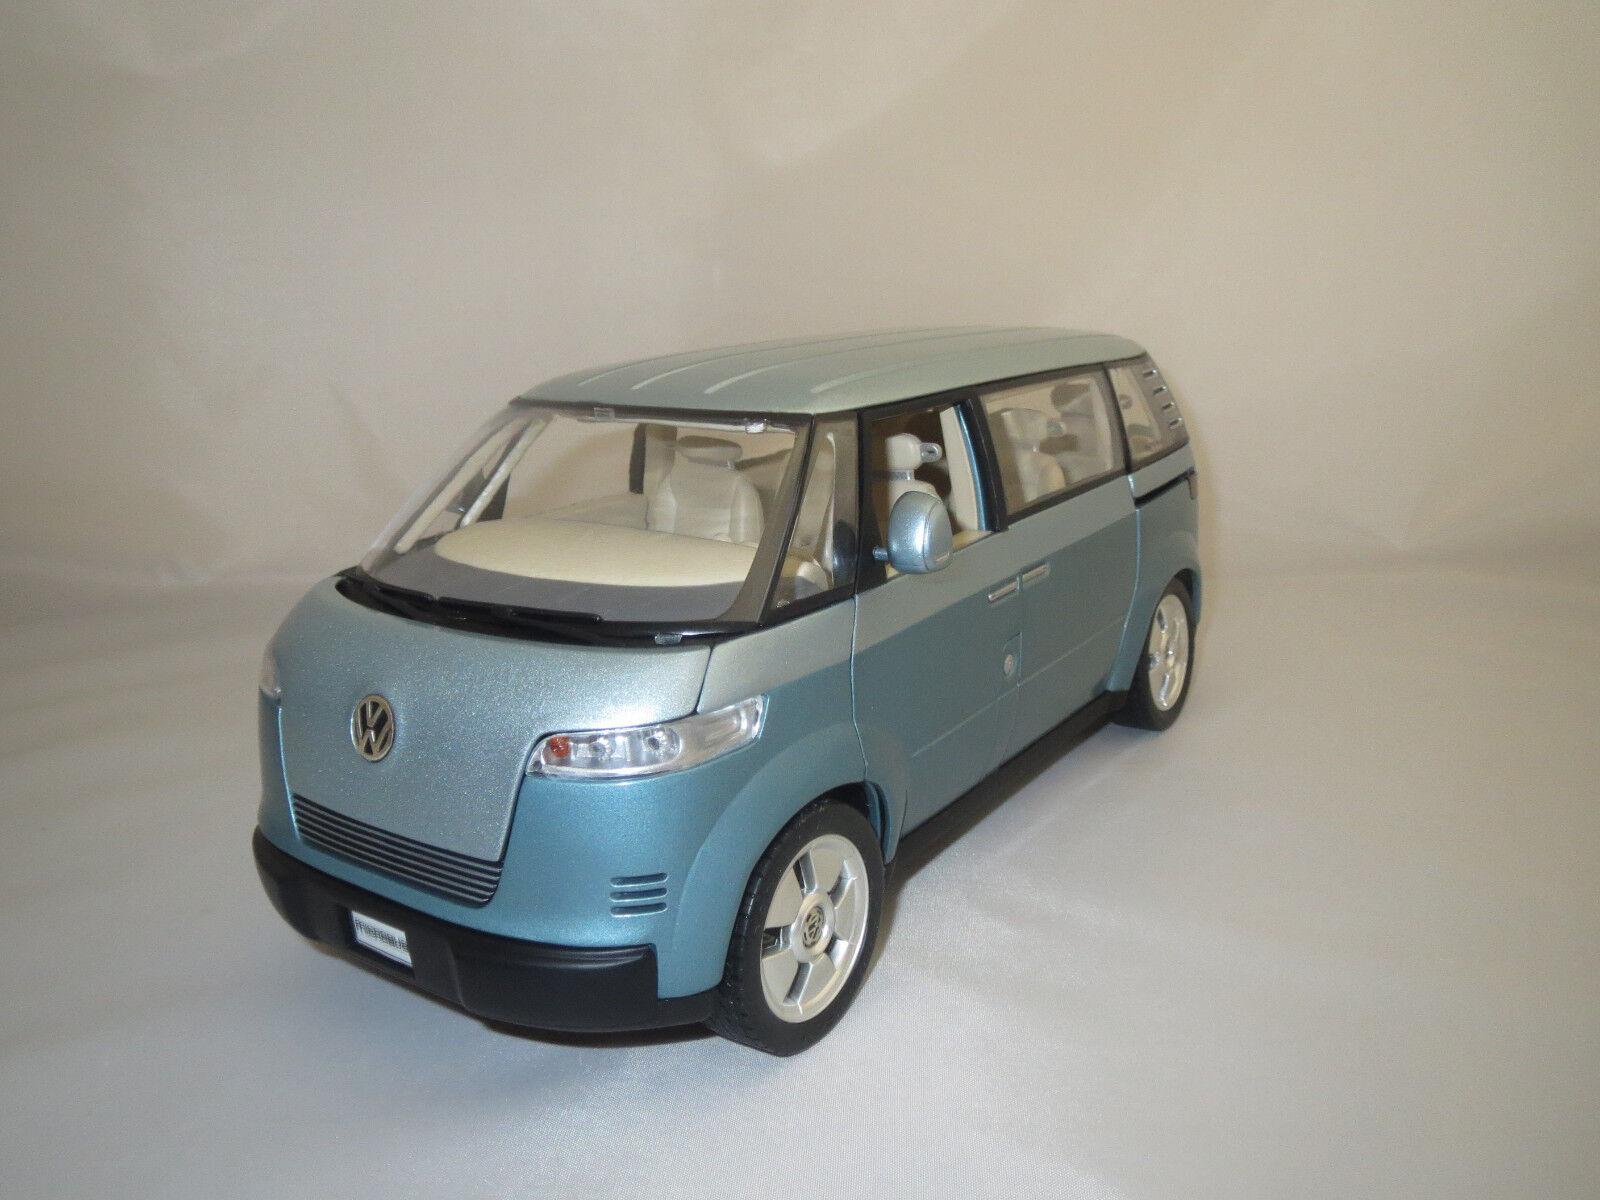 se descuenta Revell Revell Revell volkswagen microbus  azul claro-metallic  1 18 sin embalaje     orden ahora disfrutar de gran descuento